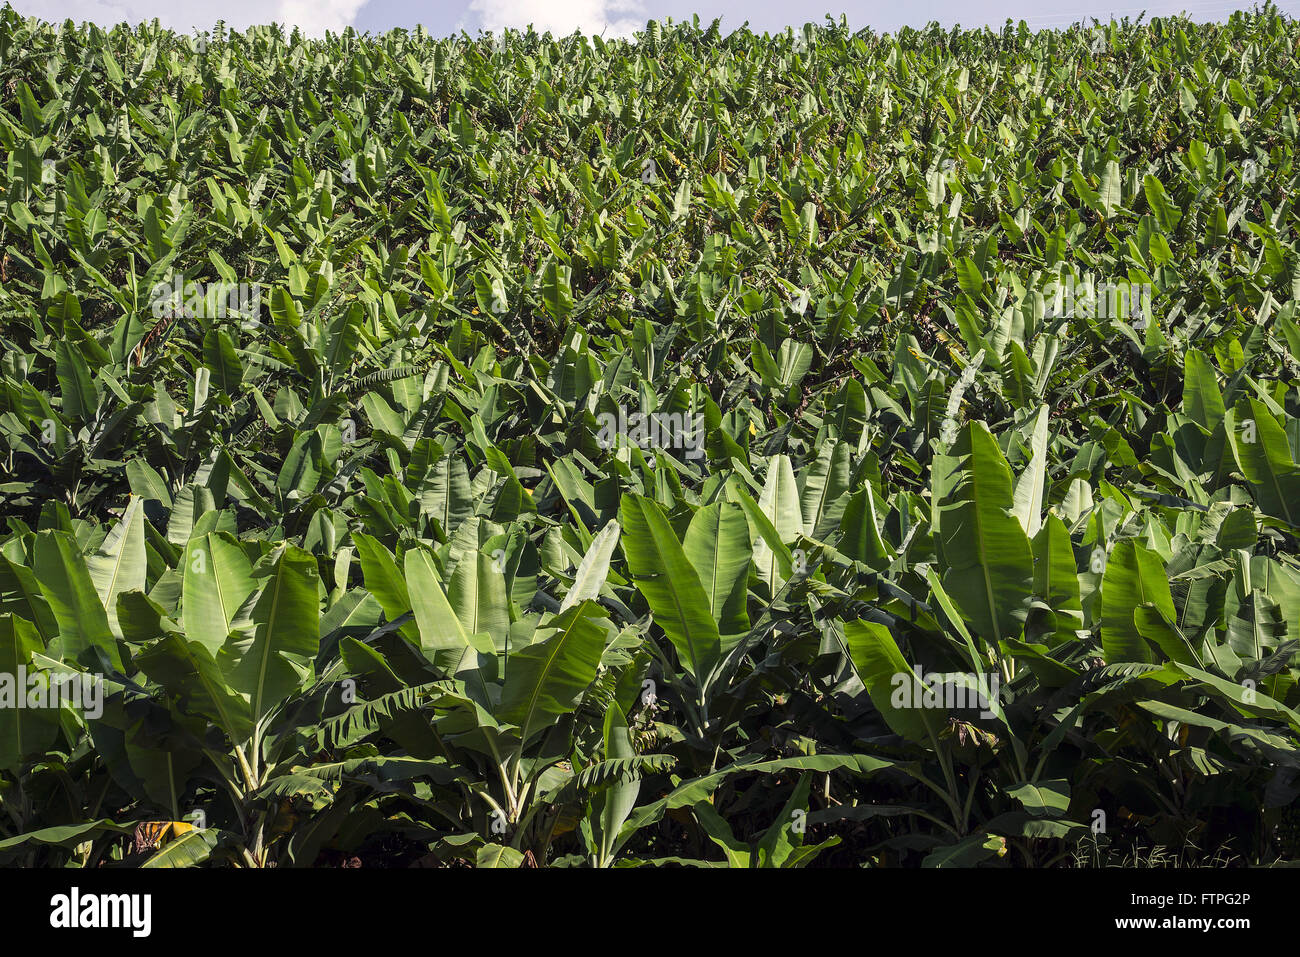 Plantation de bananes en milieu rural Photo Stock